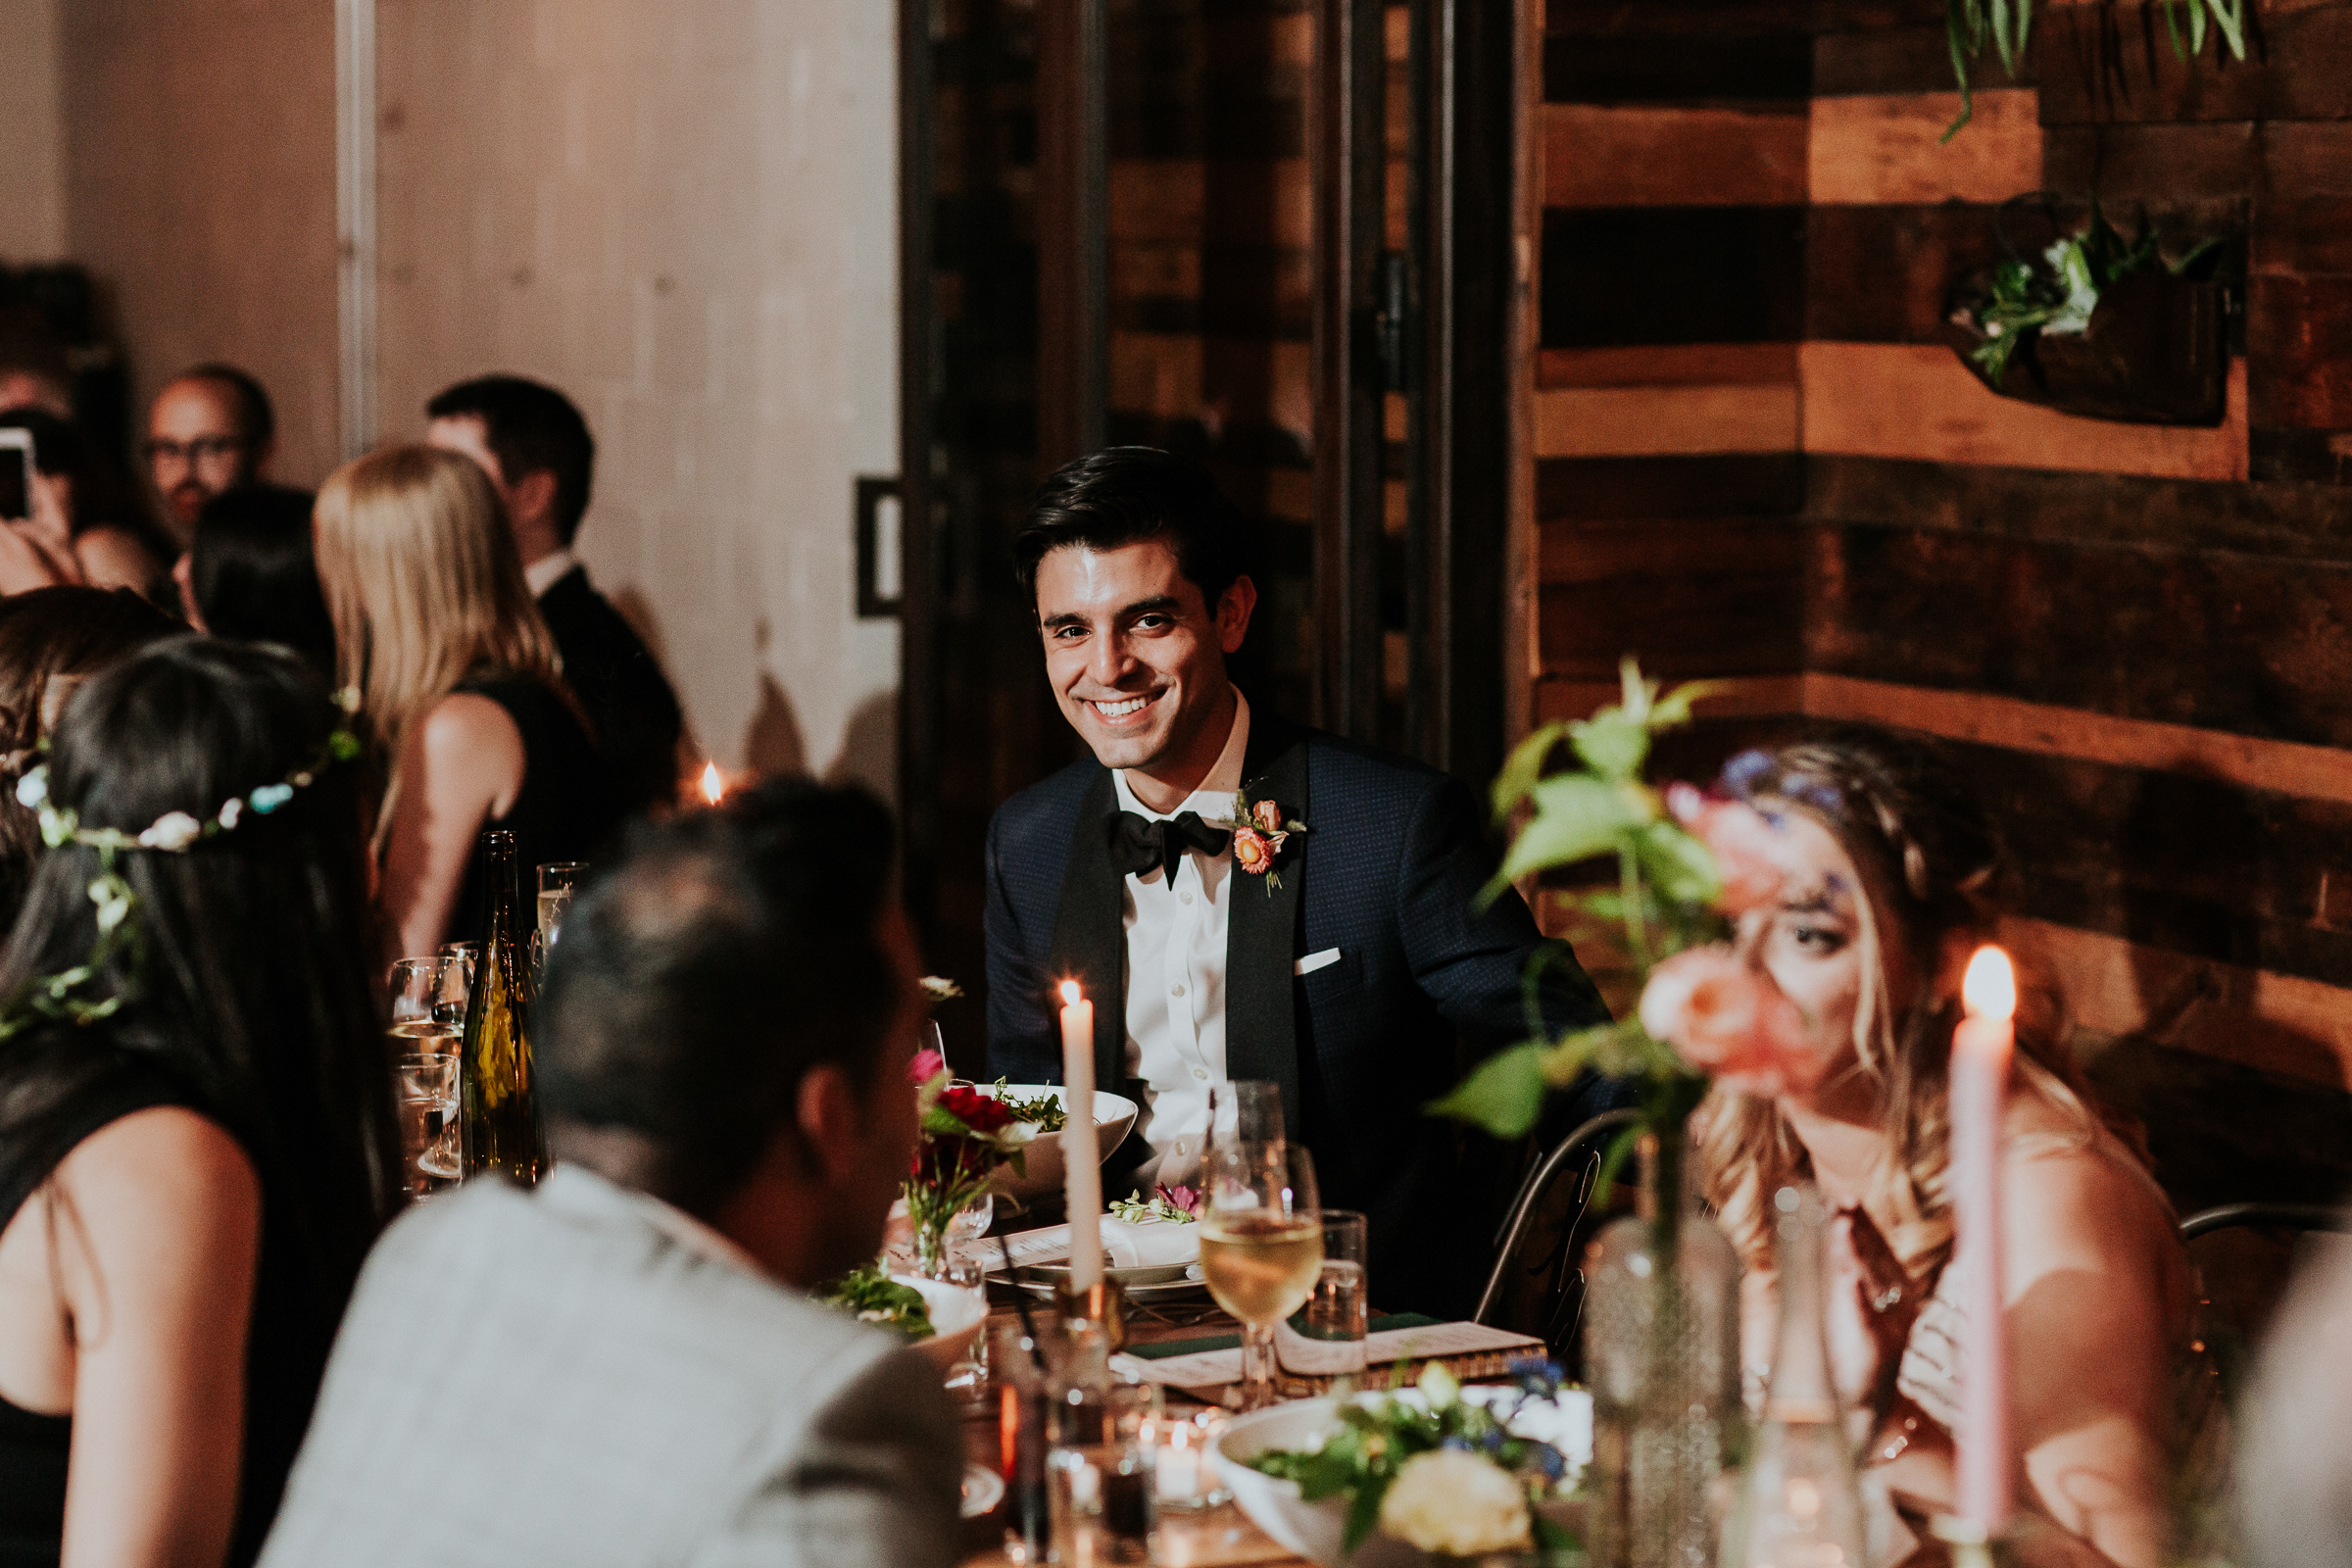 Brooklyn-Winery-NYC-Editorial-Documentary-Wedding-Photographer-Gina-Oli-87.jpg